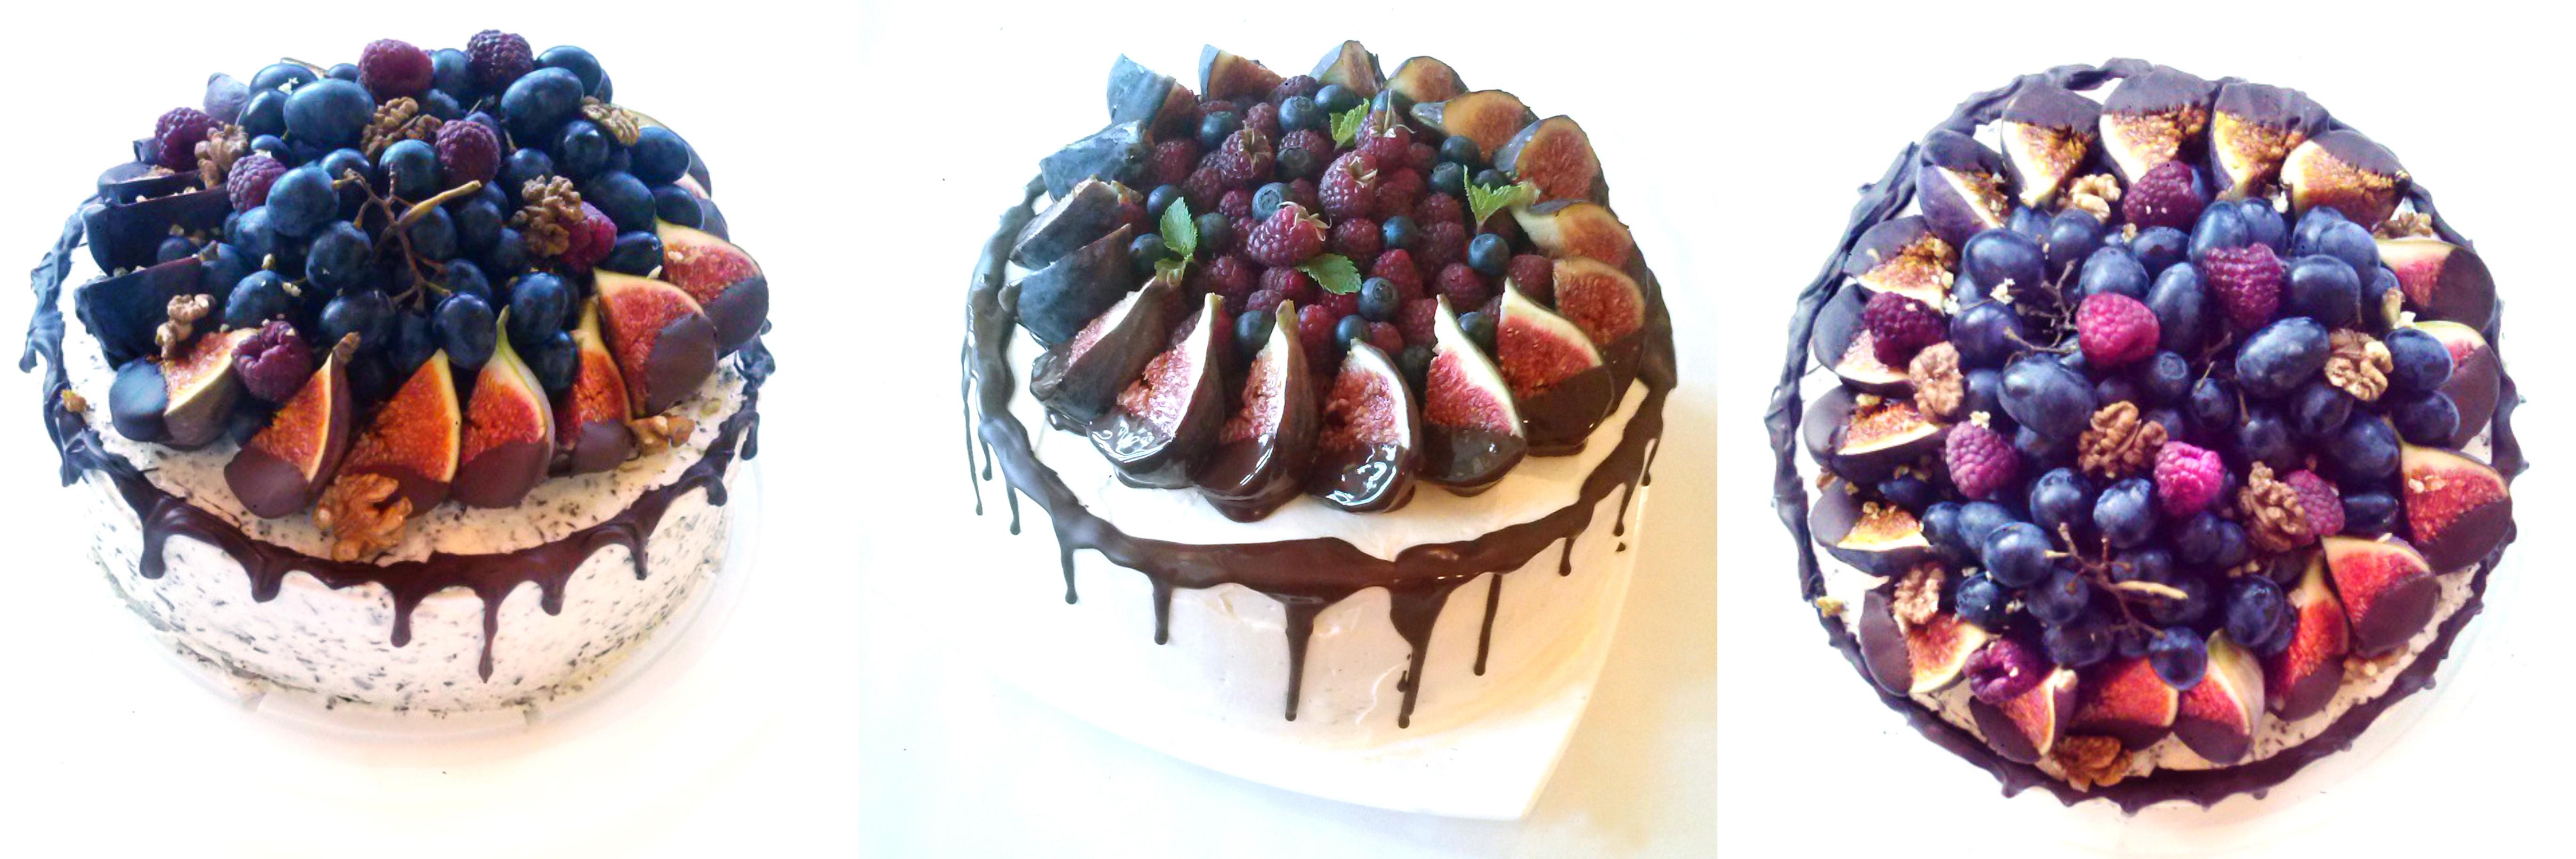 Choco glaze fig cakes